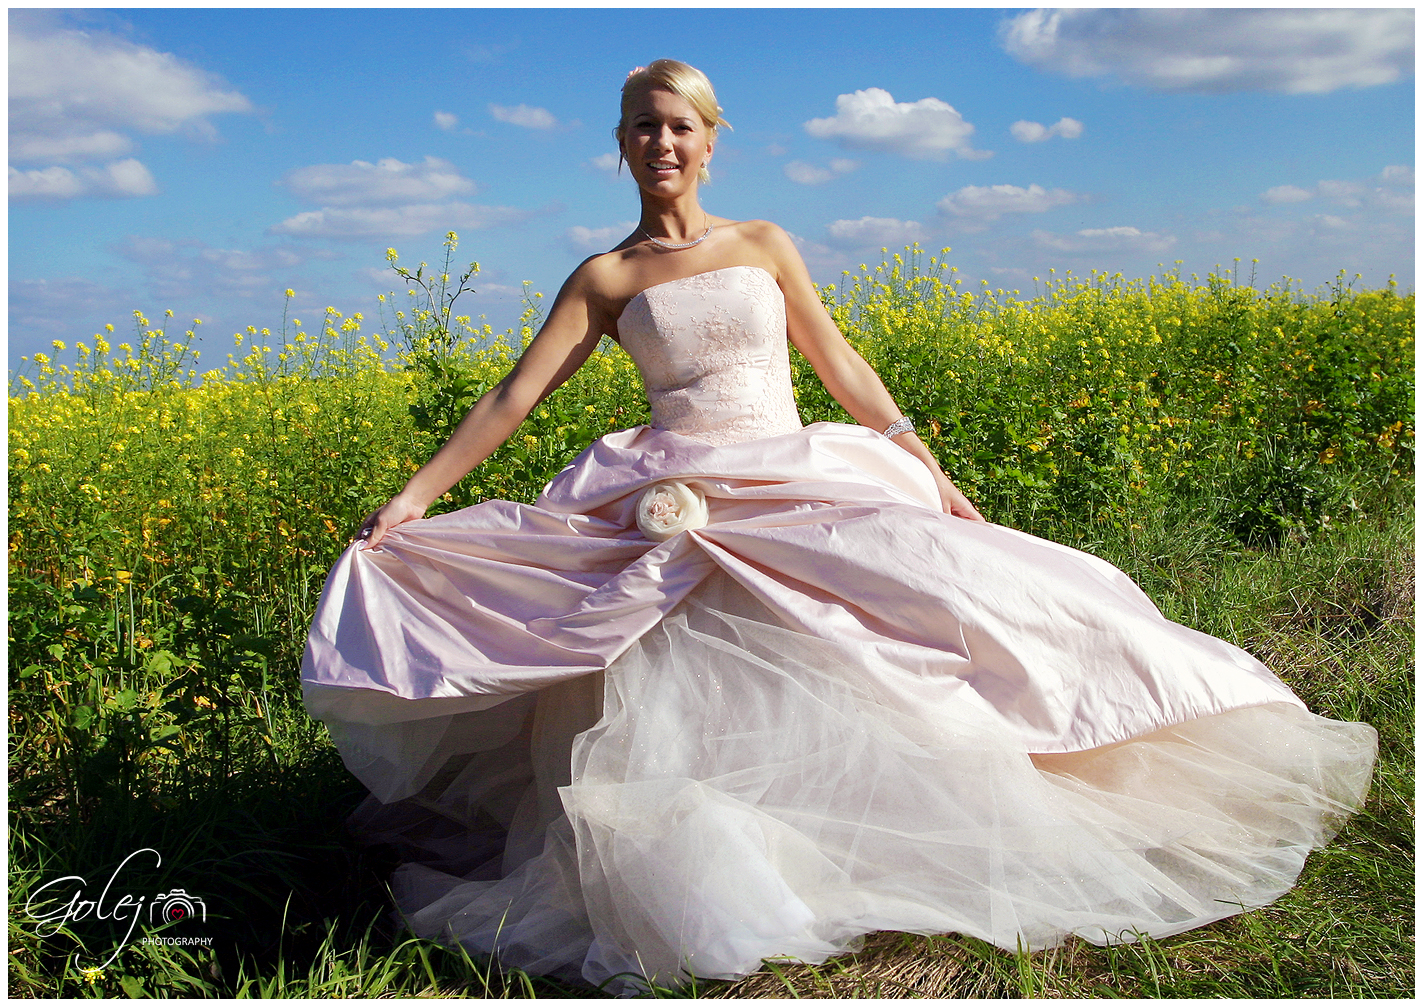 Dobry svadobny fotograf